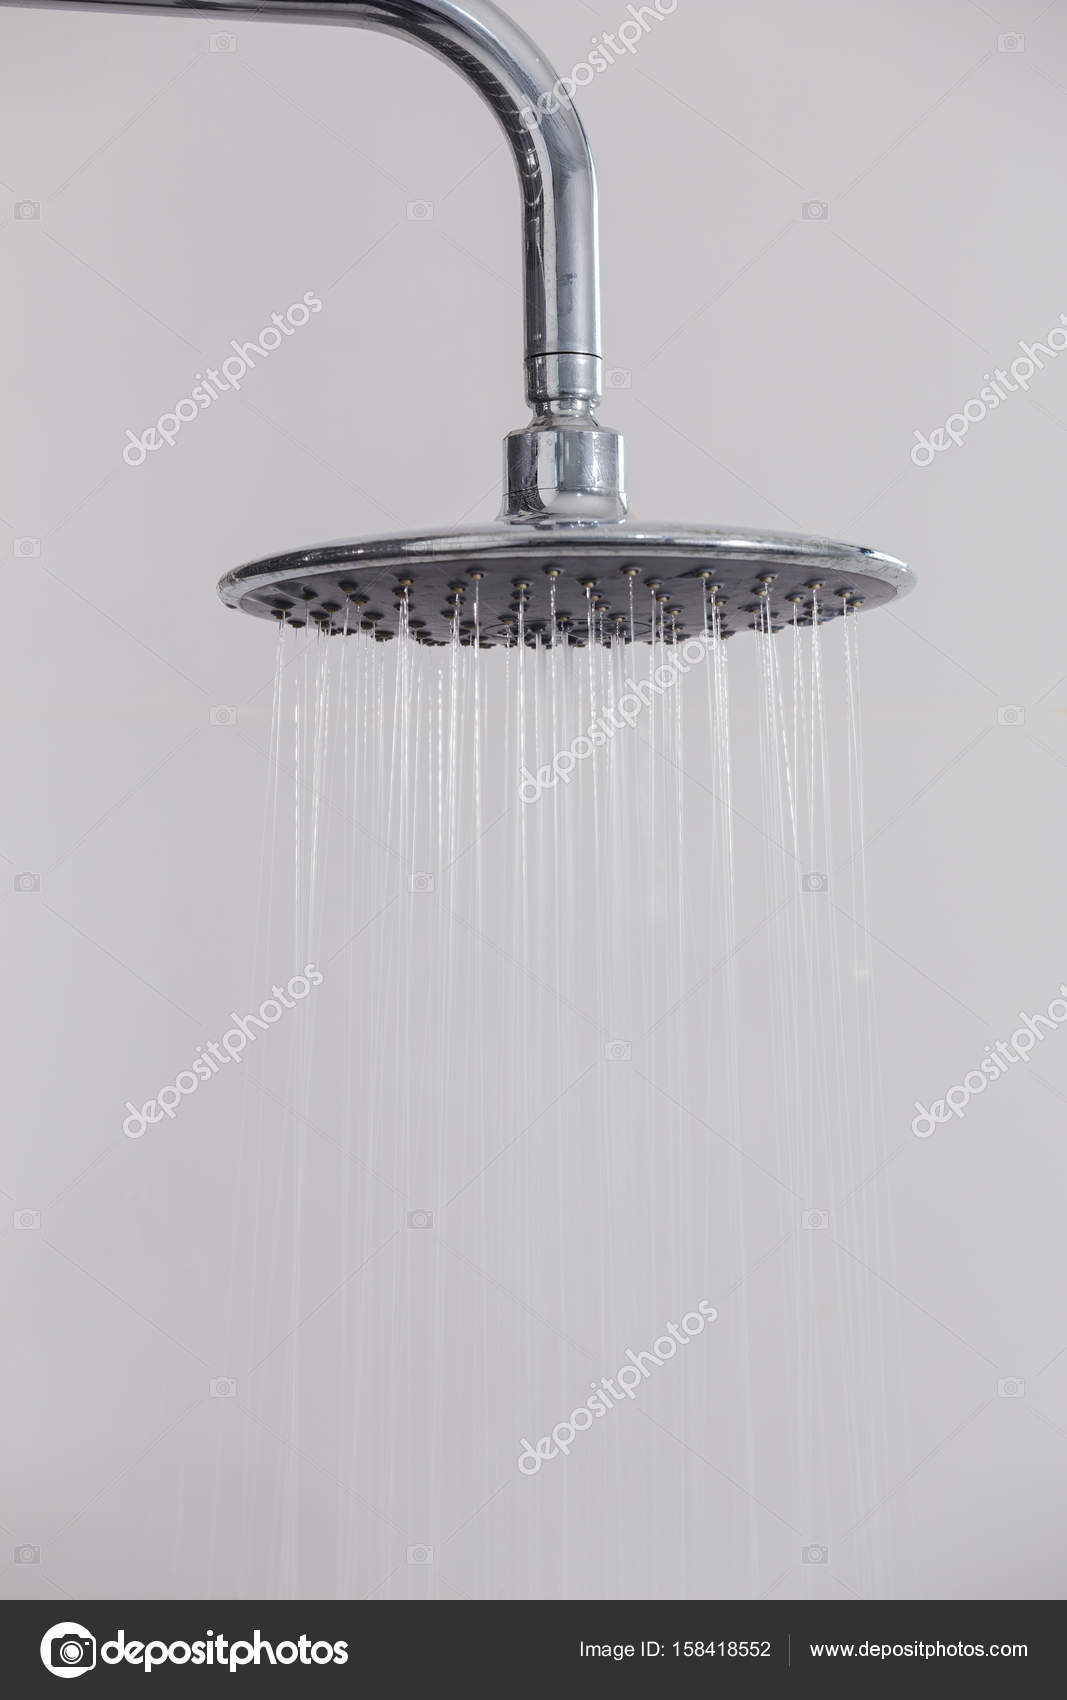 rain shower head in bathroom — Stock Photo © geargodz #158418552